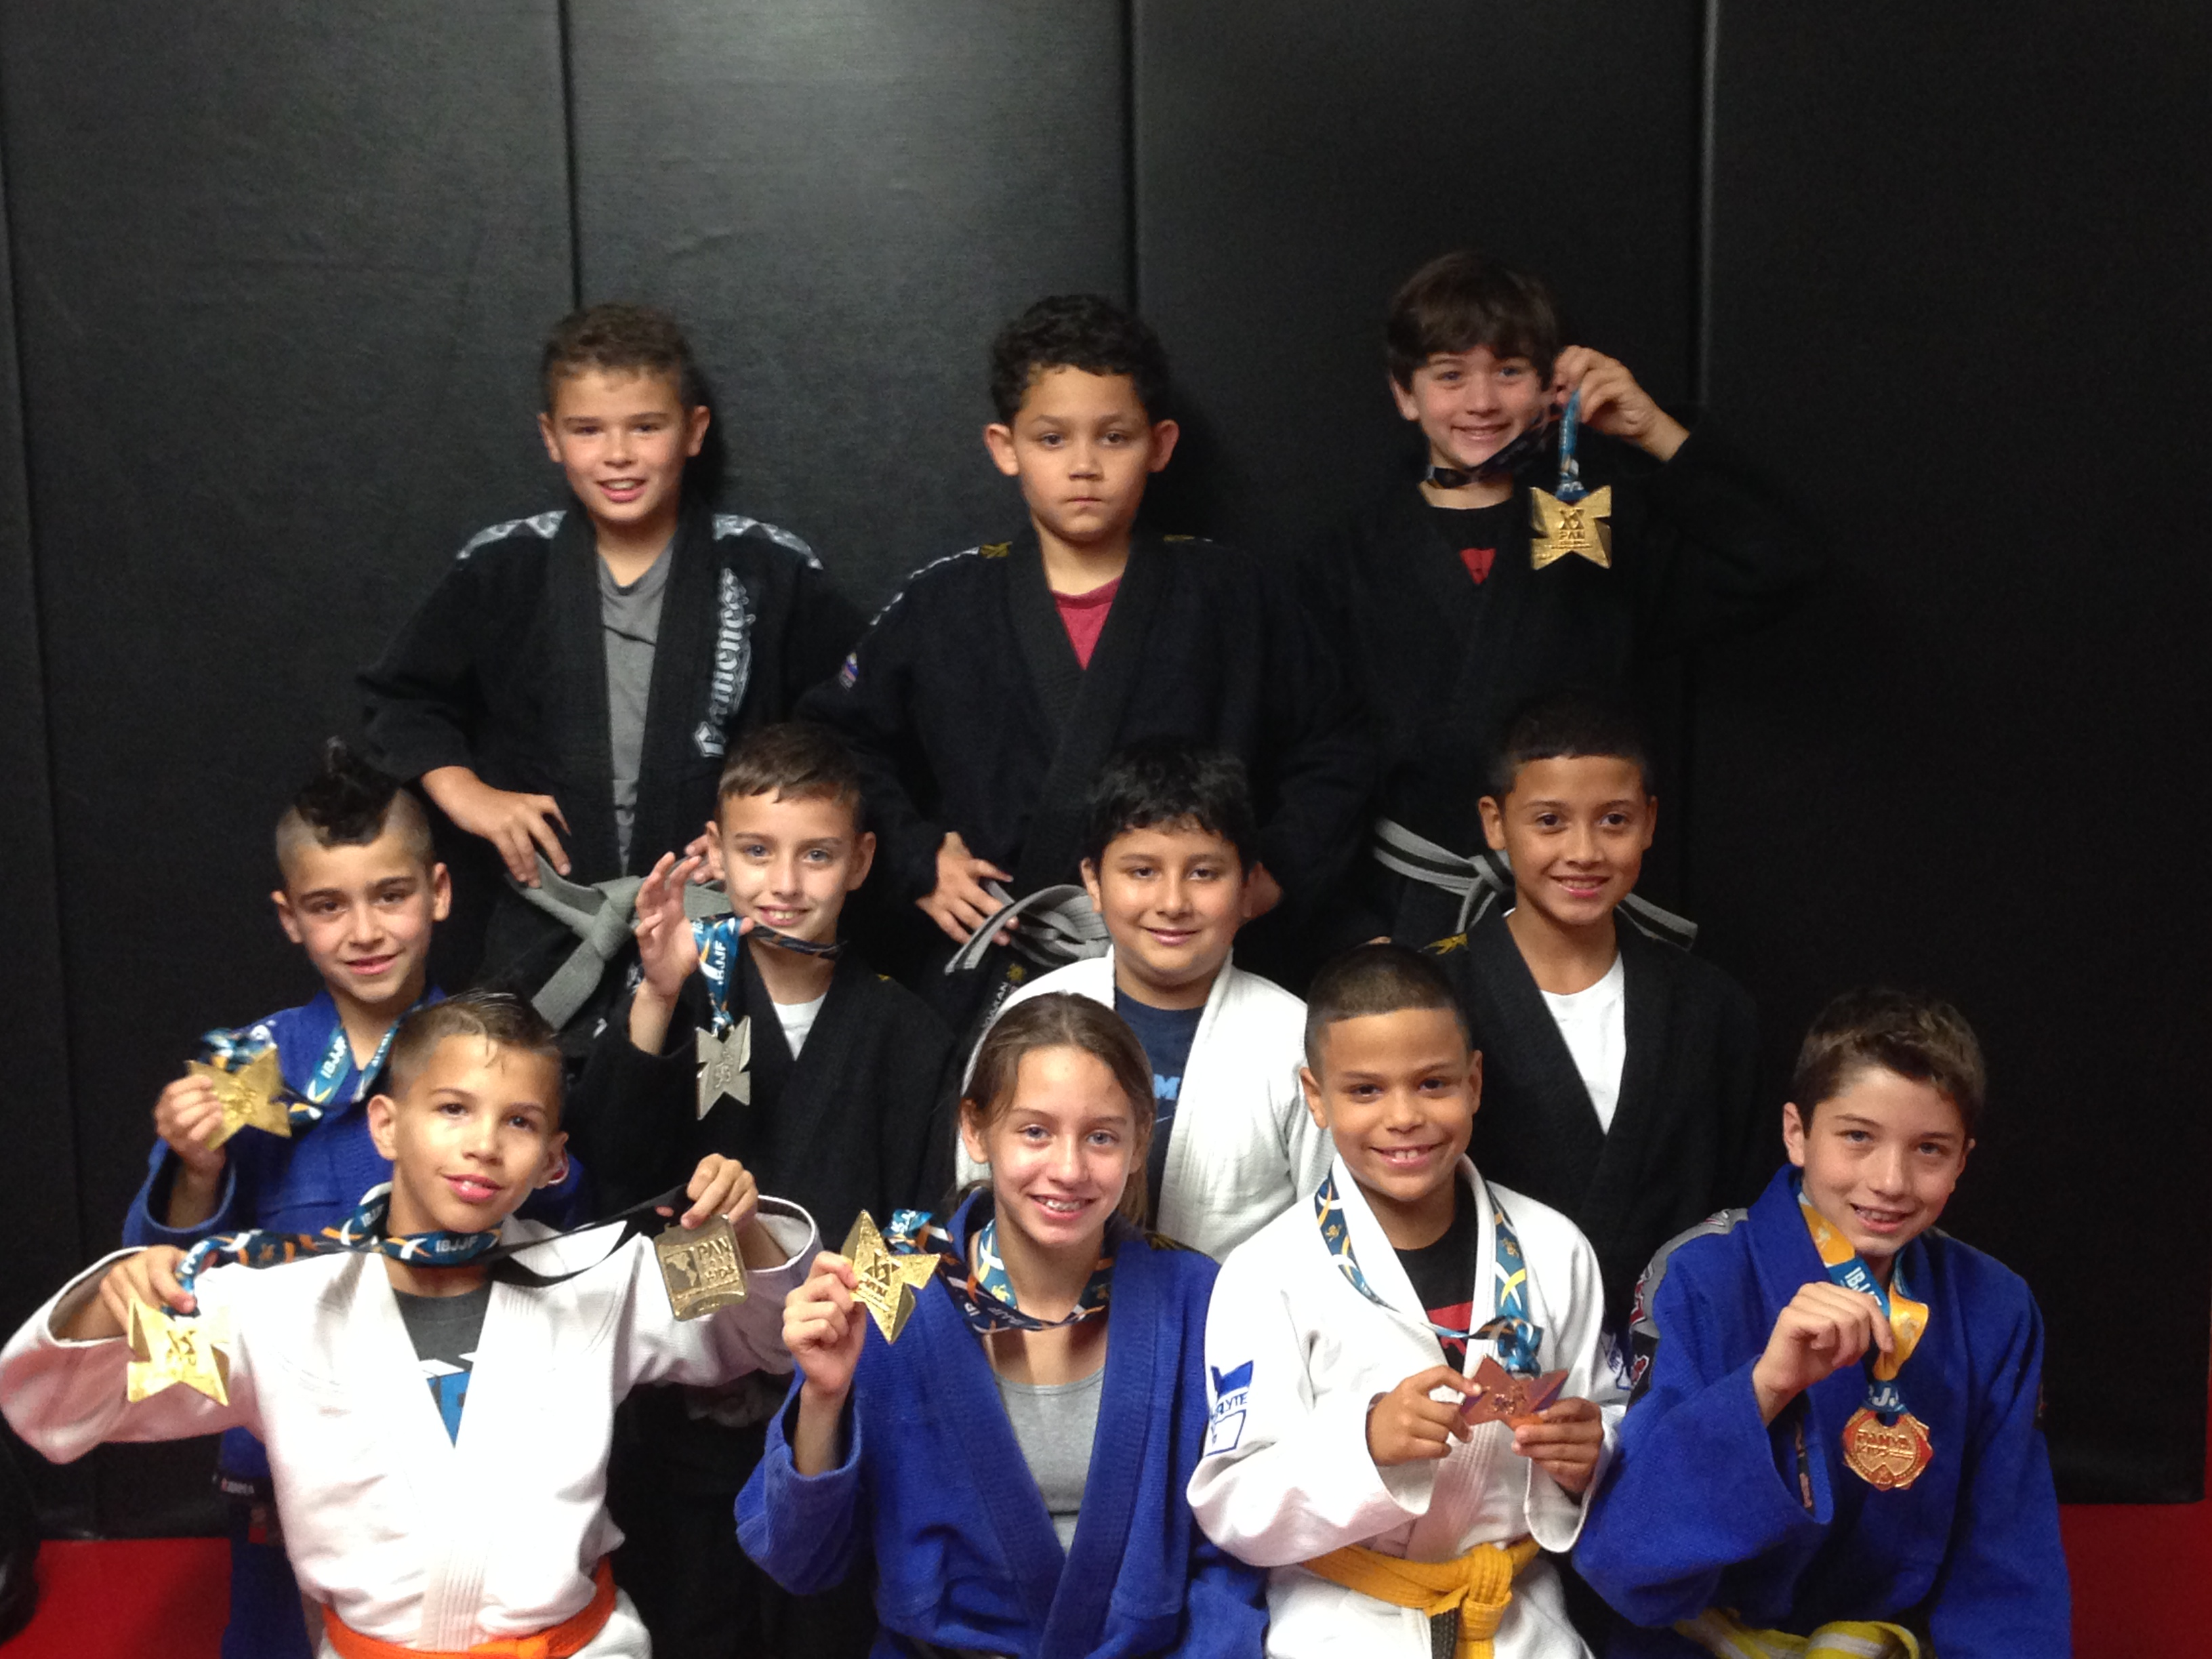 The Alliance Miami WMB kids team at the 2014 IBJJF Pan Kids. Photo: Personal Archive